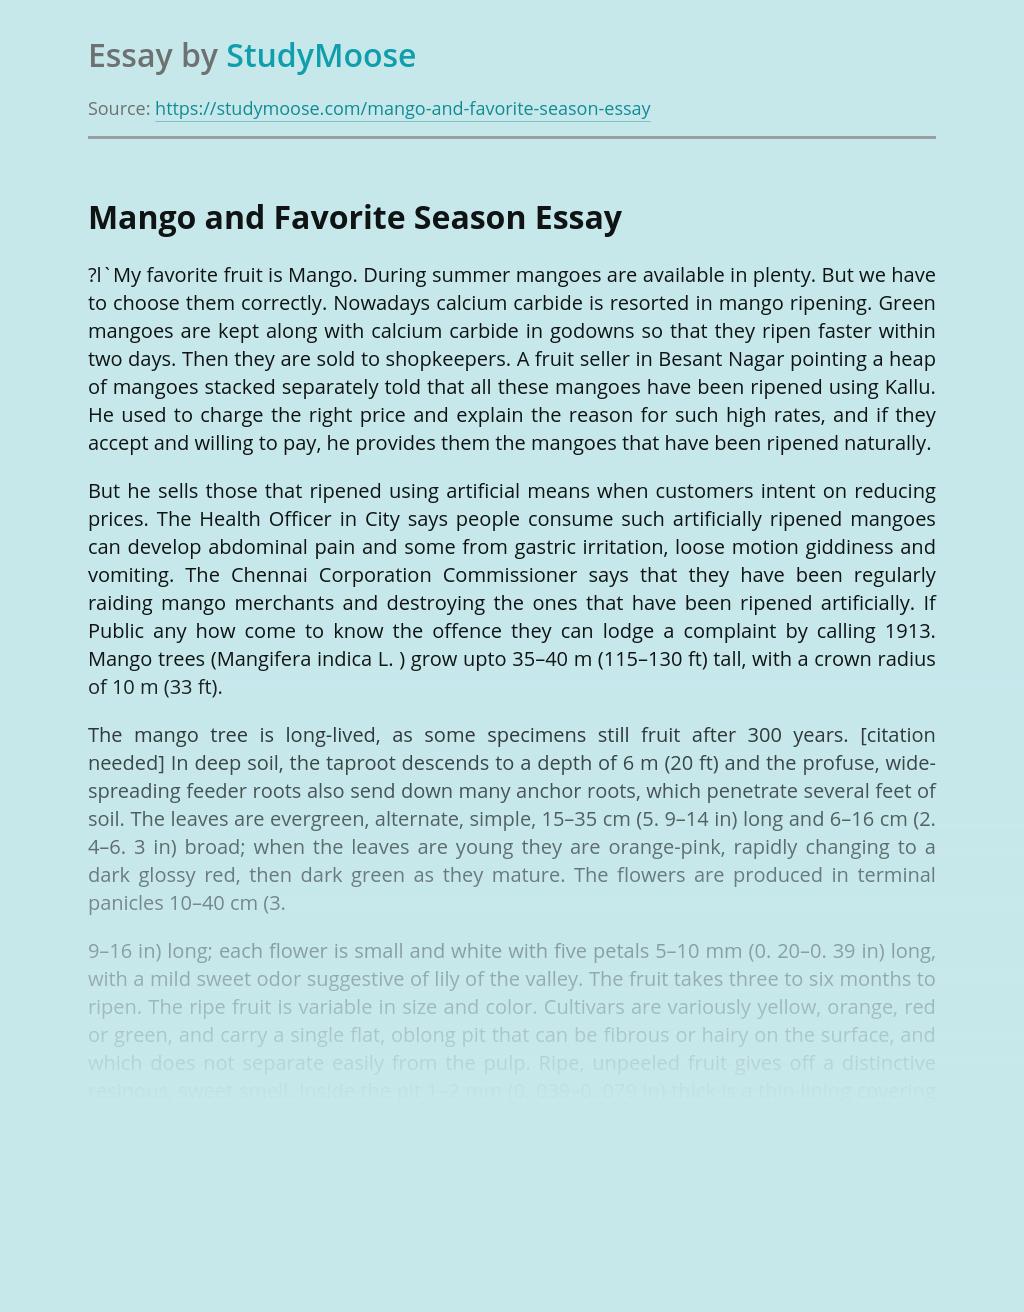 Mango and Favorite Season